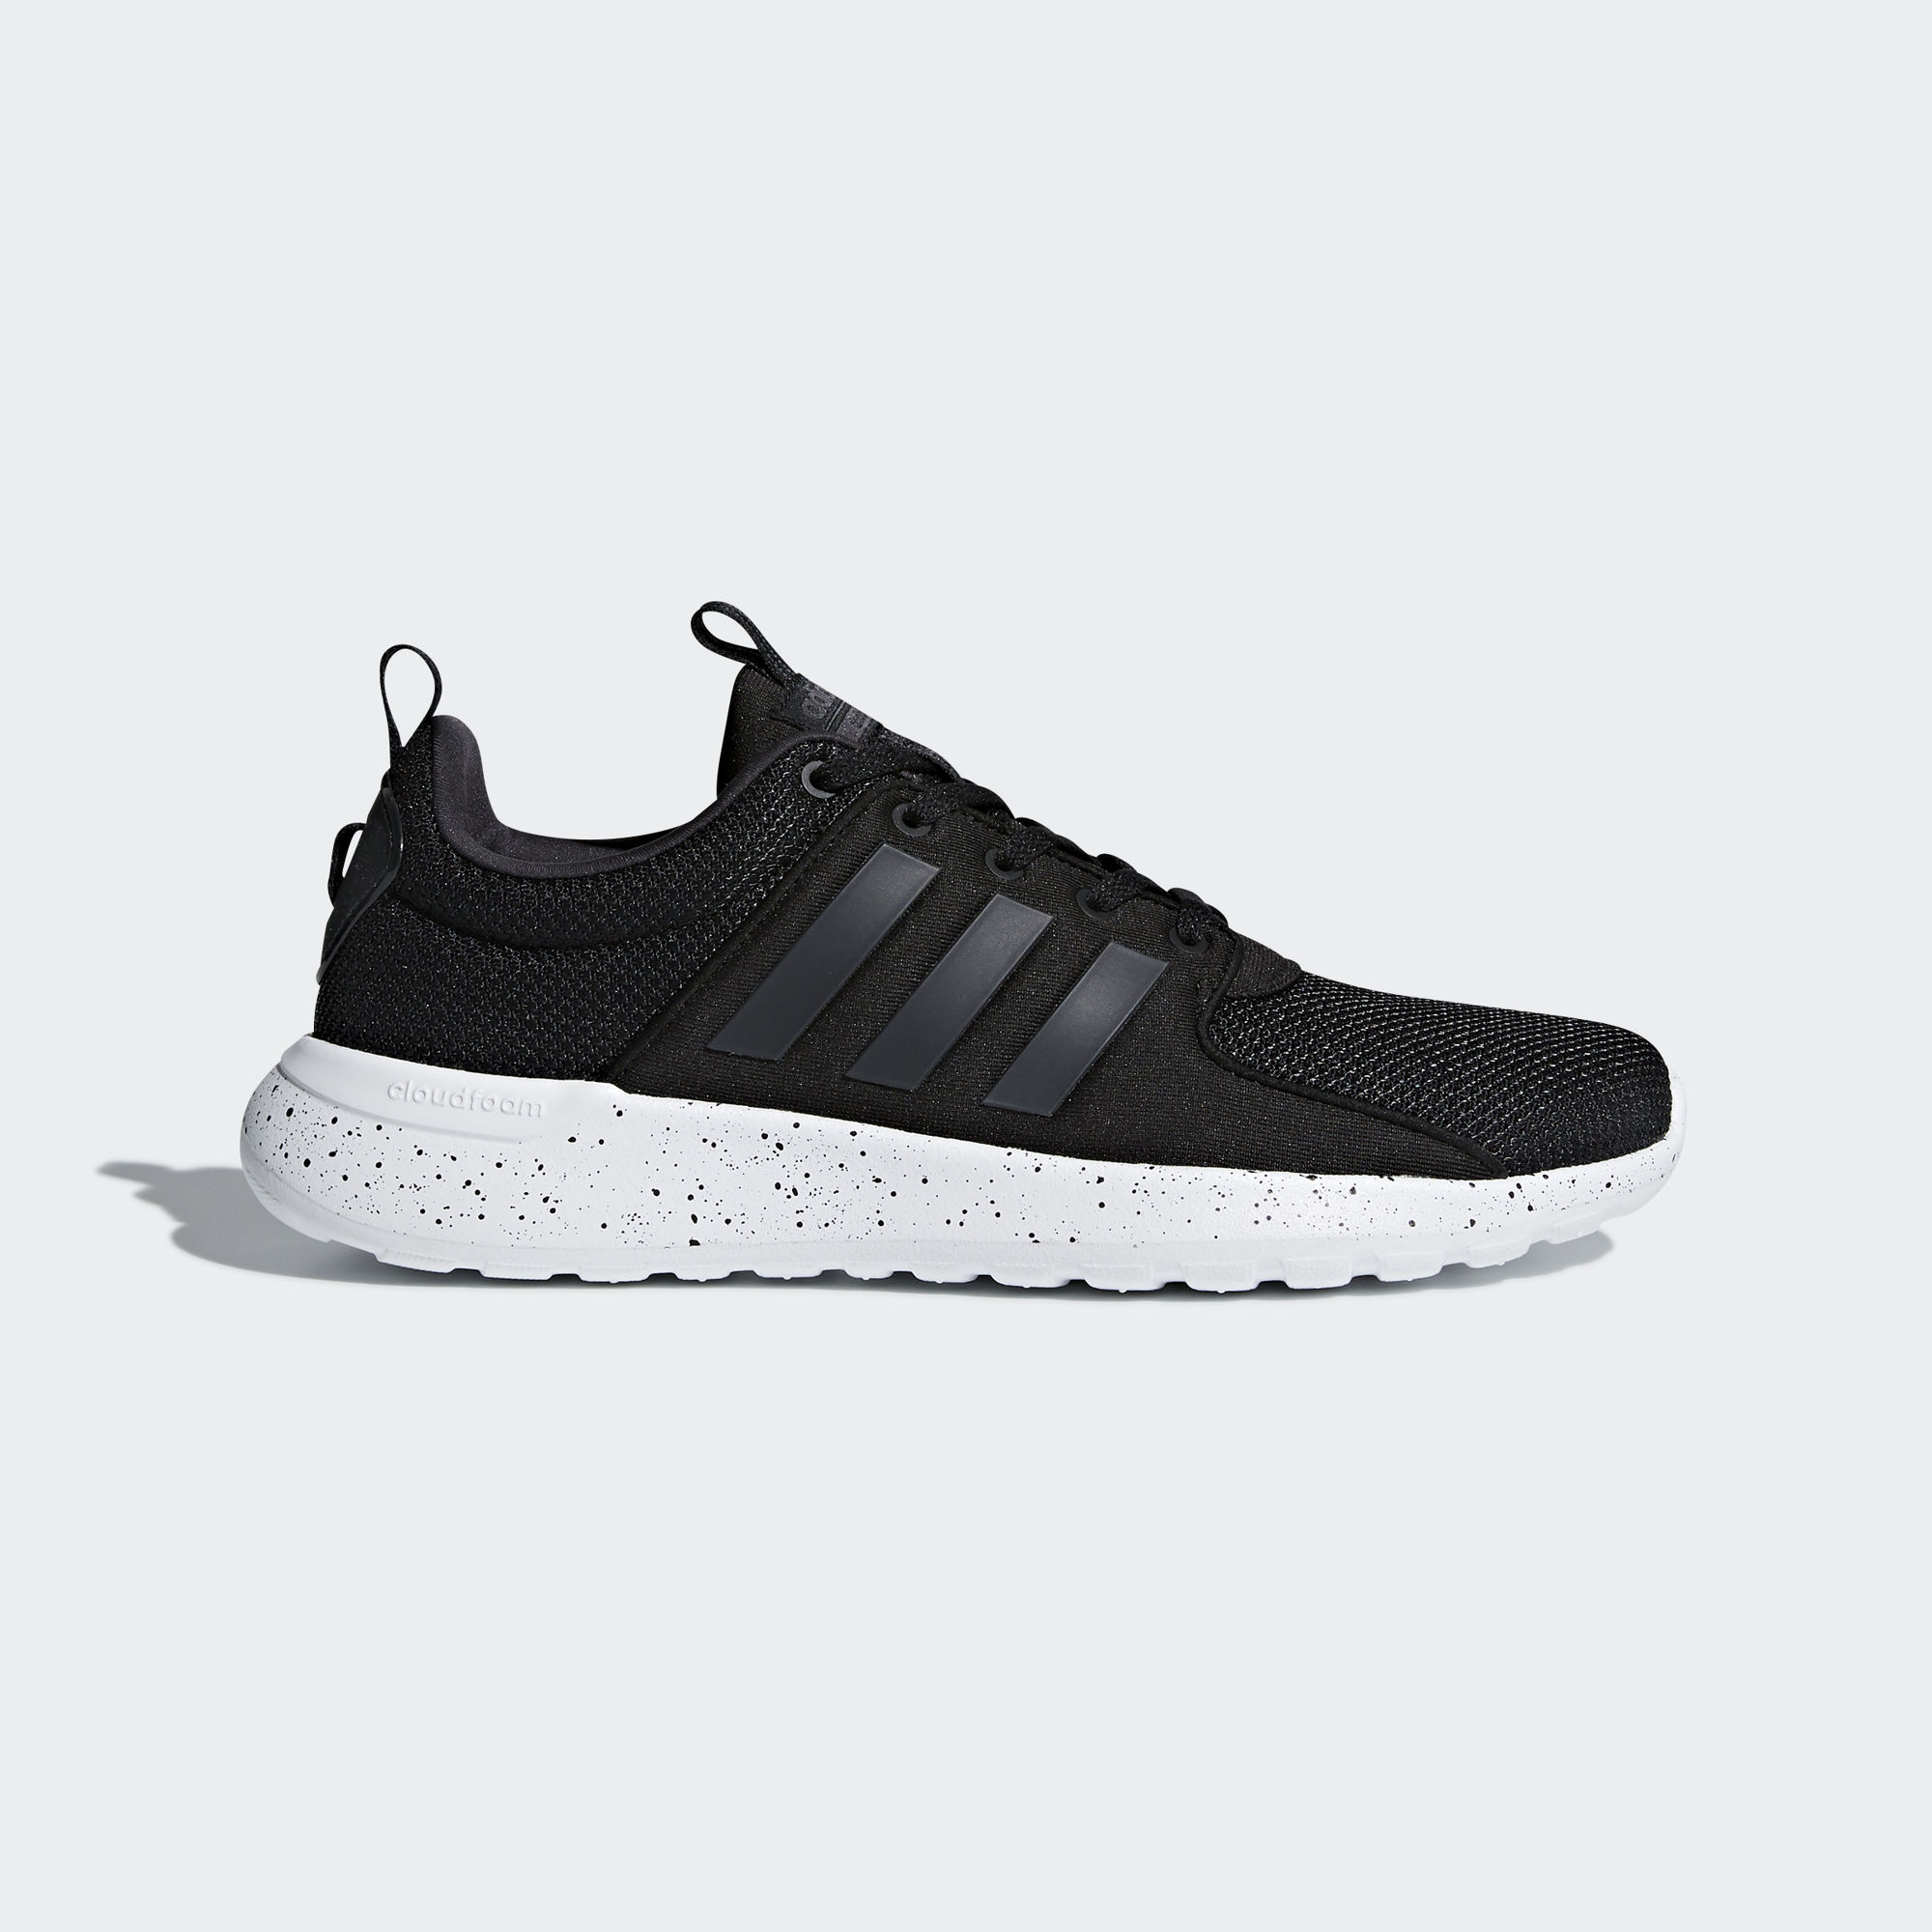 c01579f21b7 DB0594 Adidas Sneakers Shoes Trainers Running Schuhe Sport Cf Lite ...